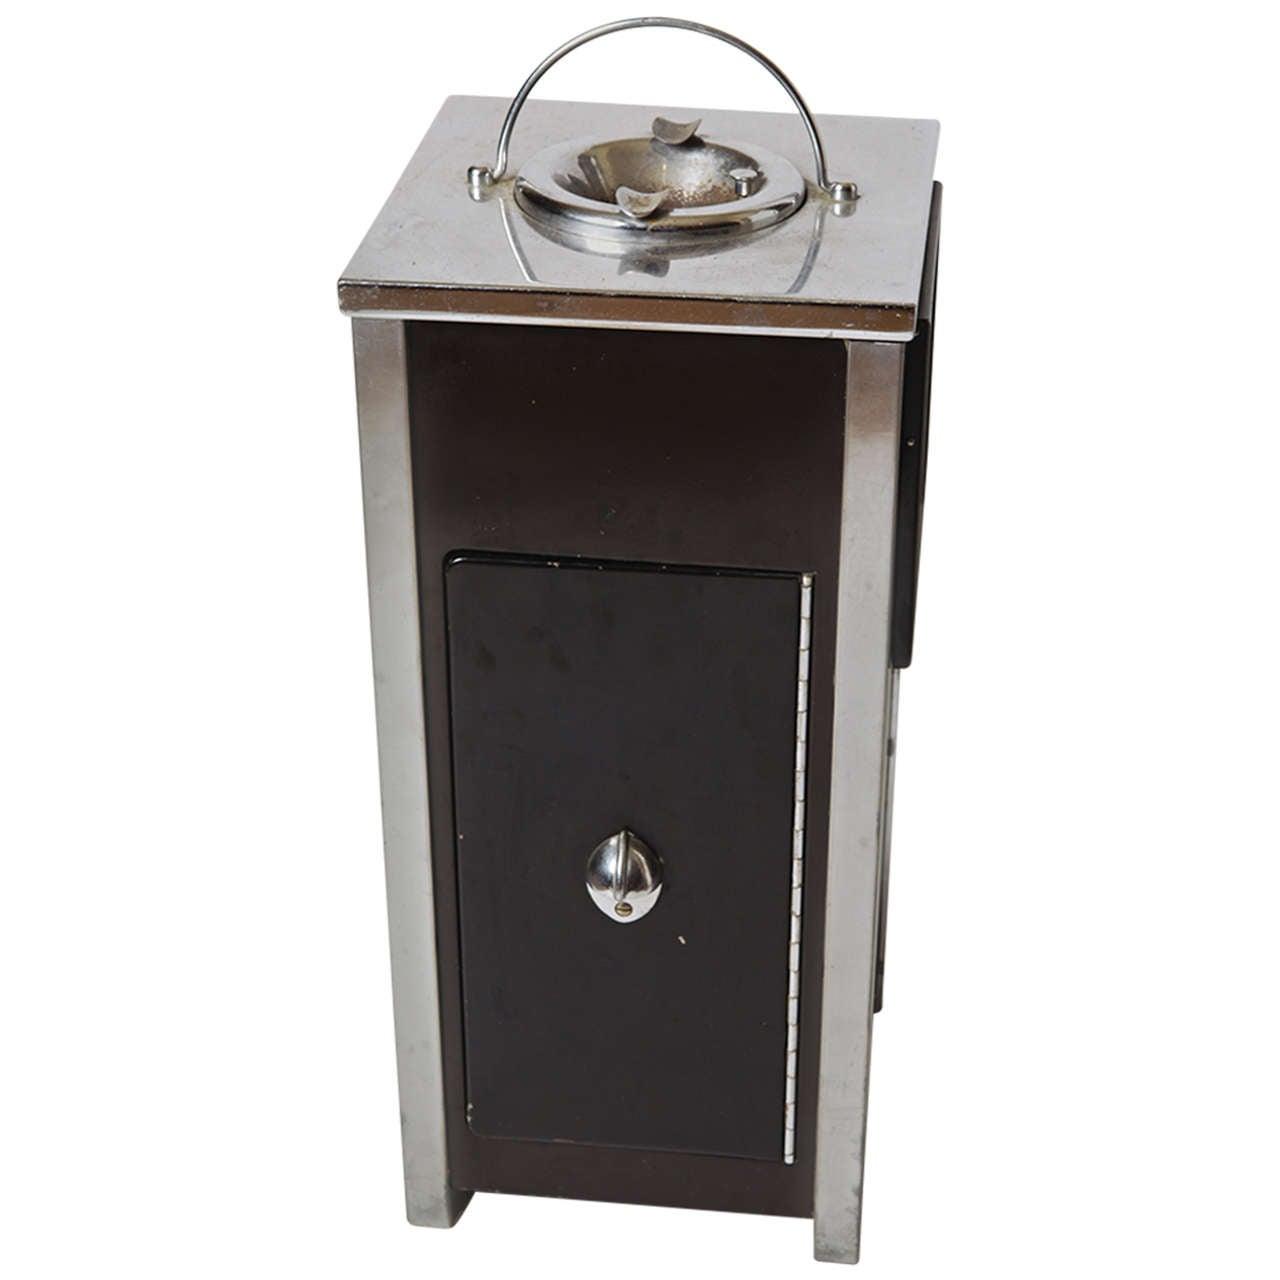 Machine Age Art Deco Smokestand Cocktail cabinet